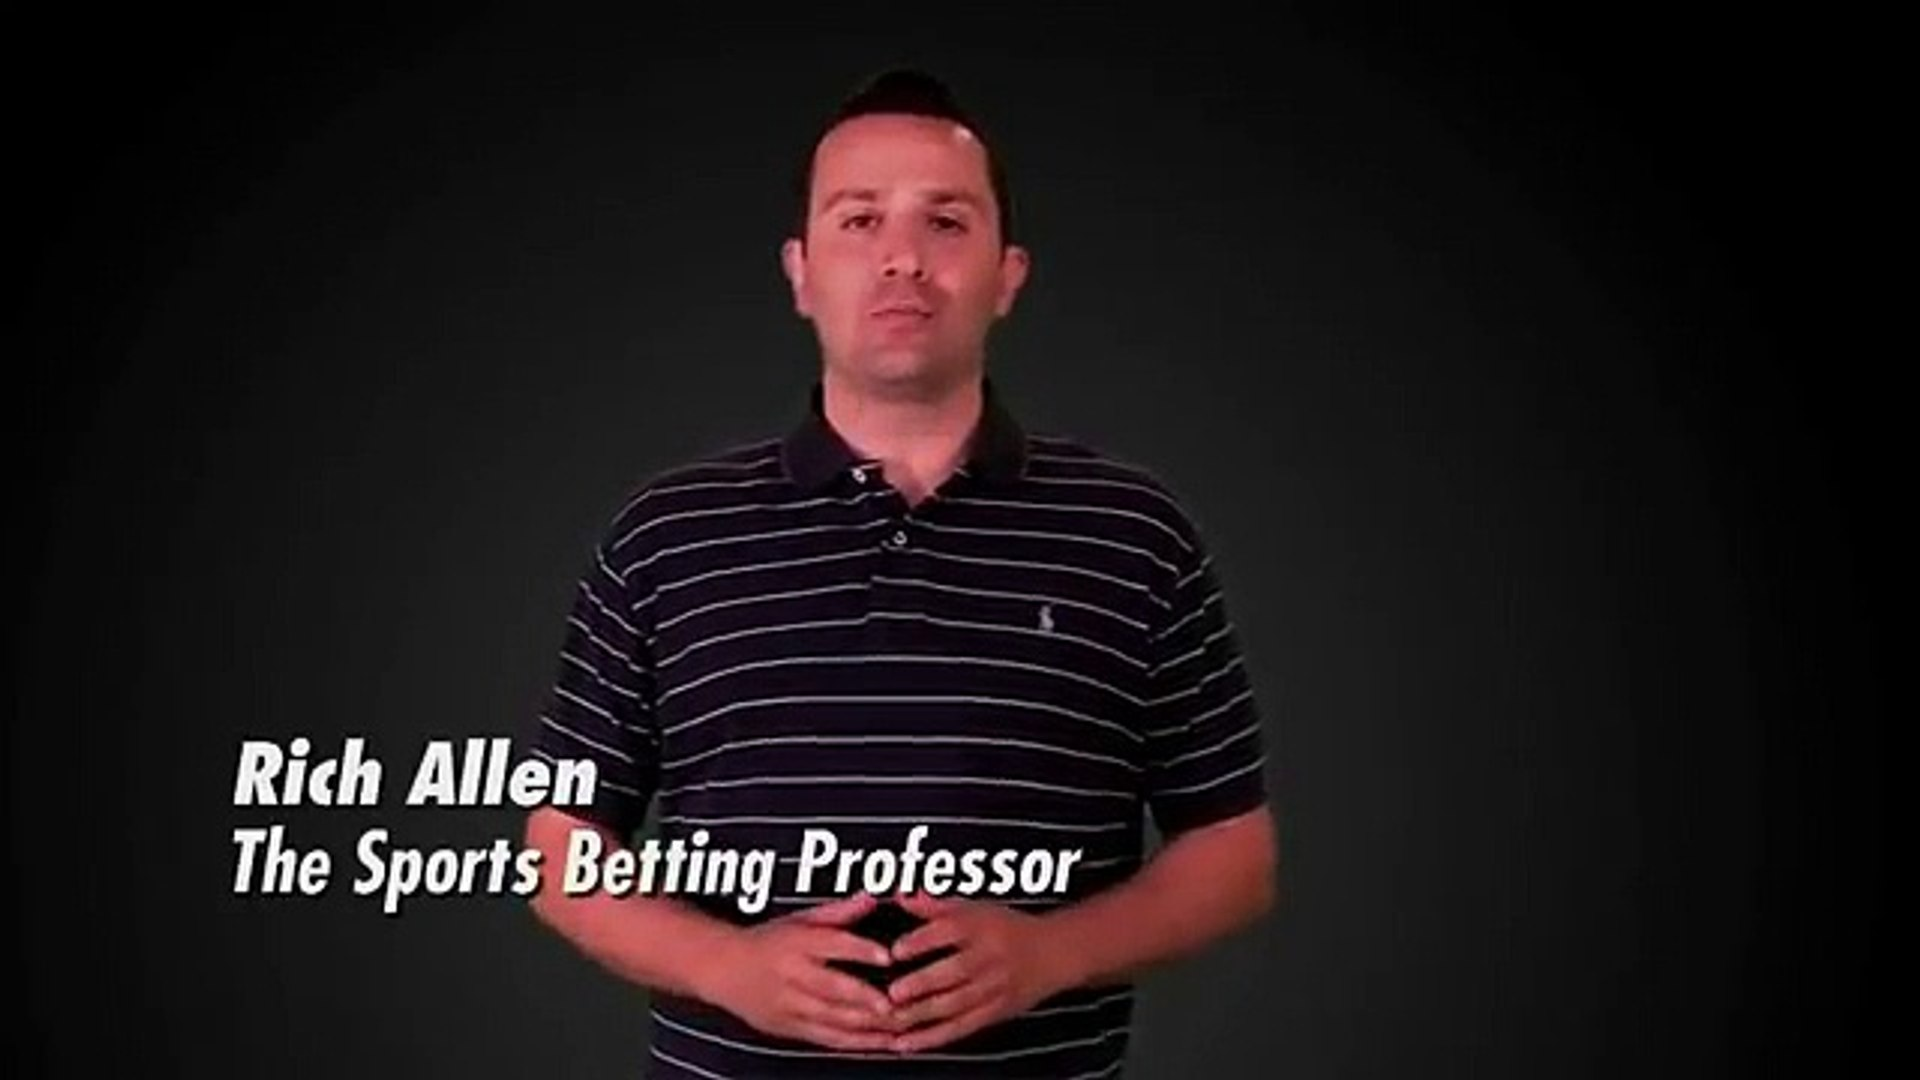 the sports betting professor